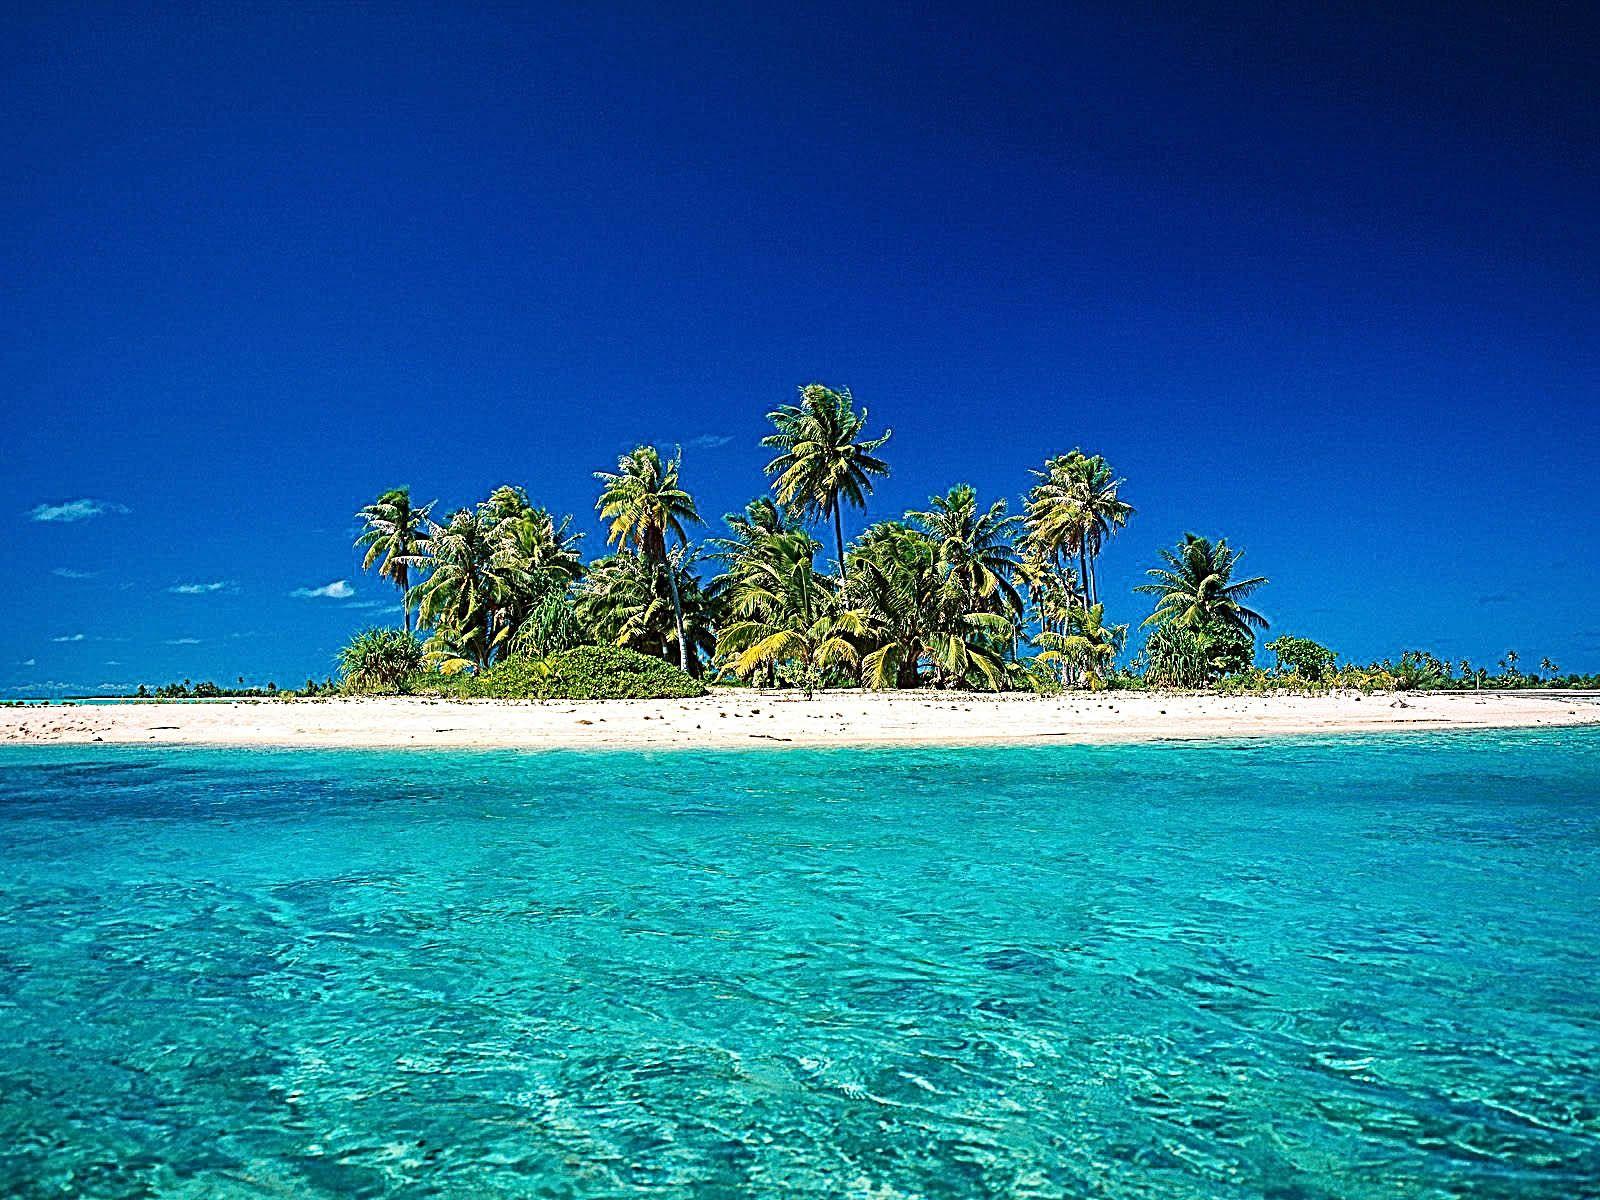 Free HD Images: Island Getaway, Bora Bora, French Polynesia